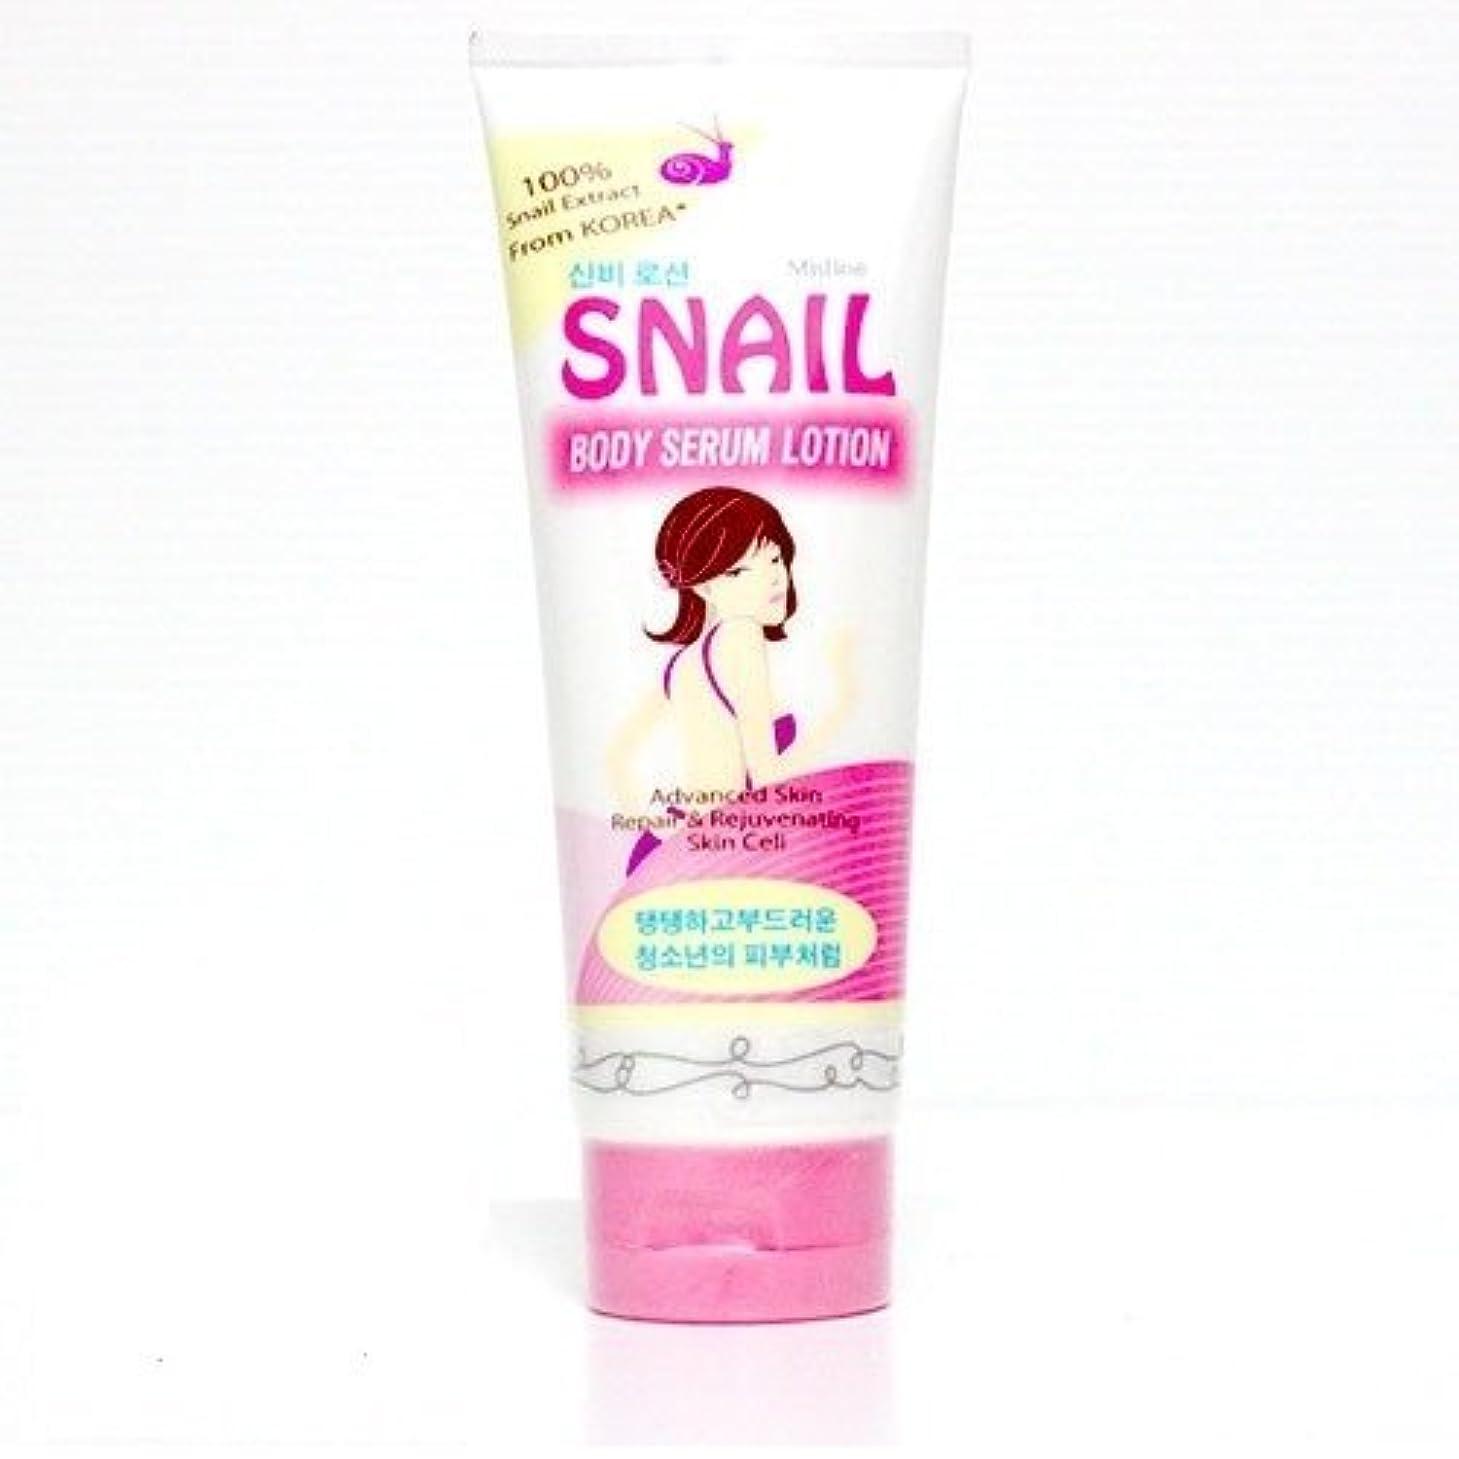 放送起業家真似るMistine Snail Body Serum Lotion 2 packs by Mistine [並行輸入品]